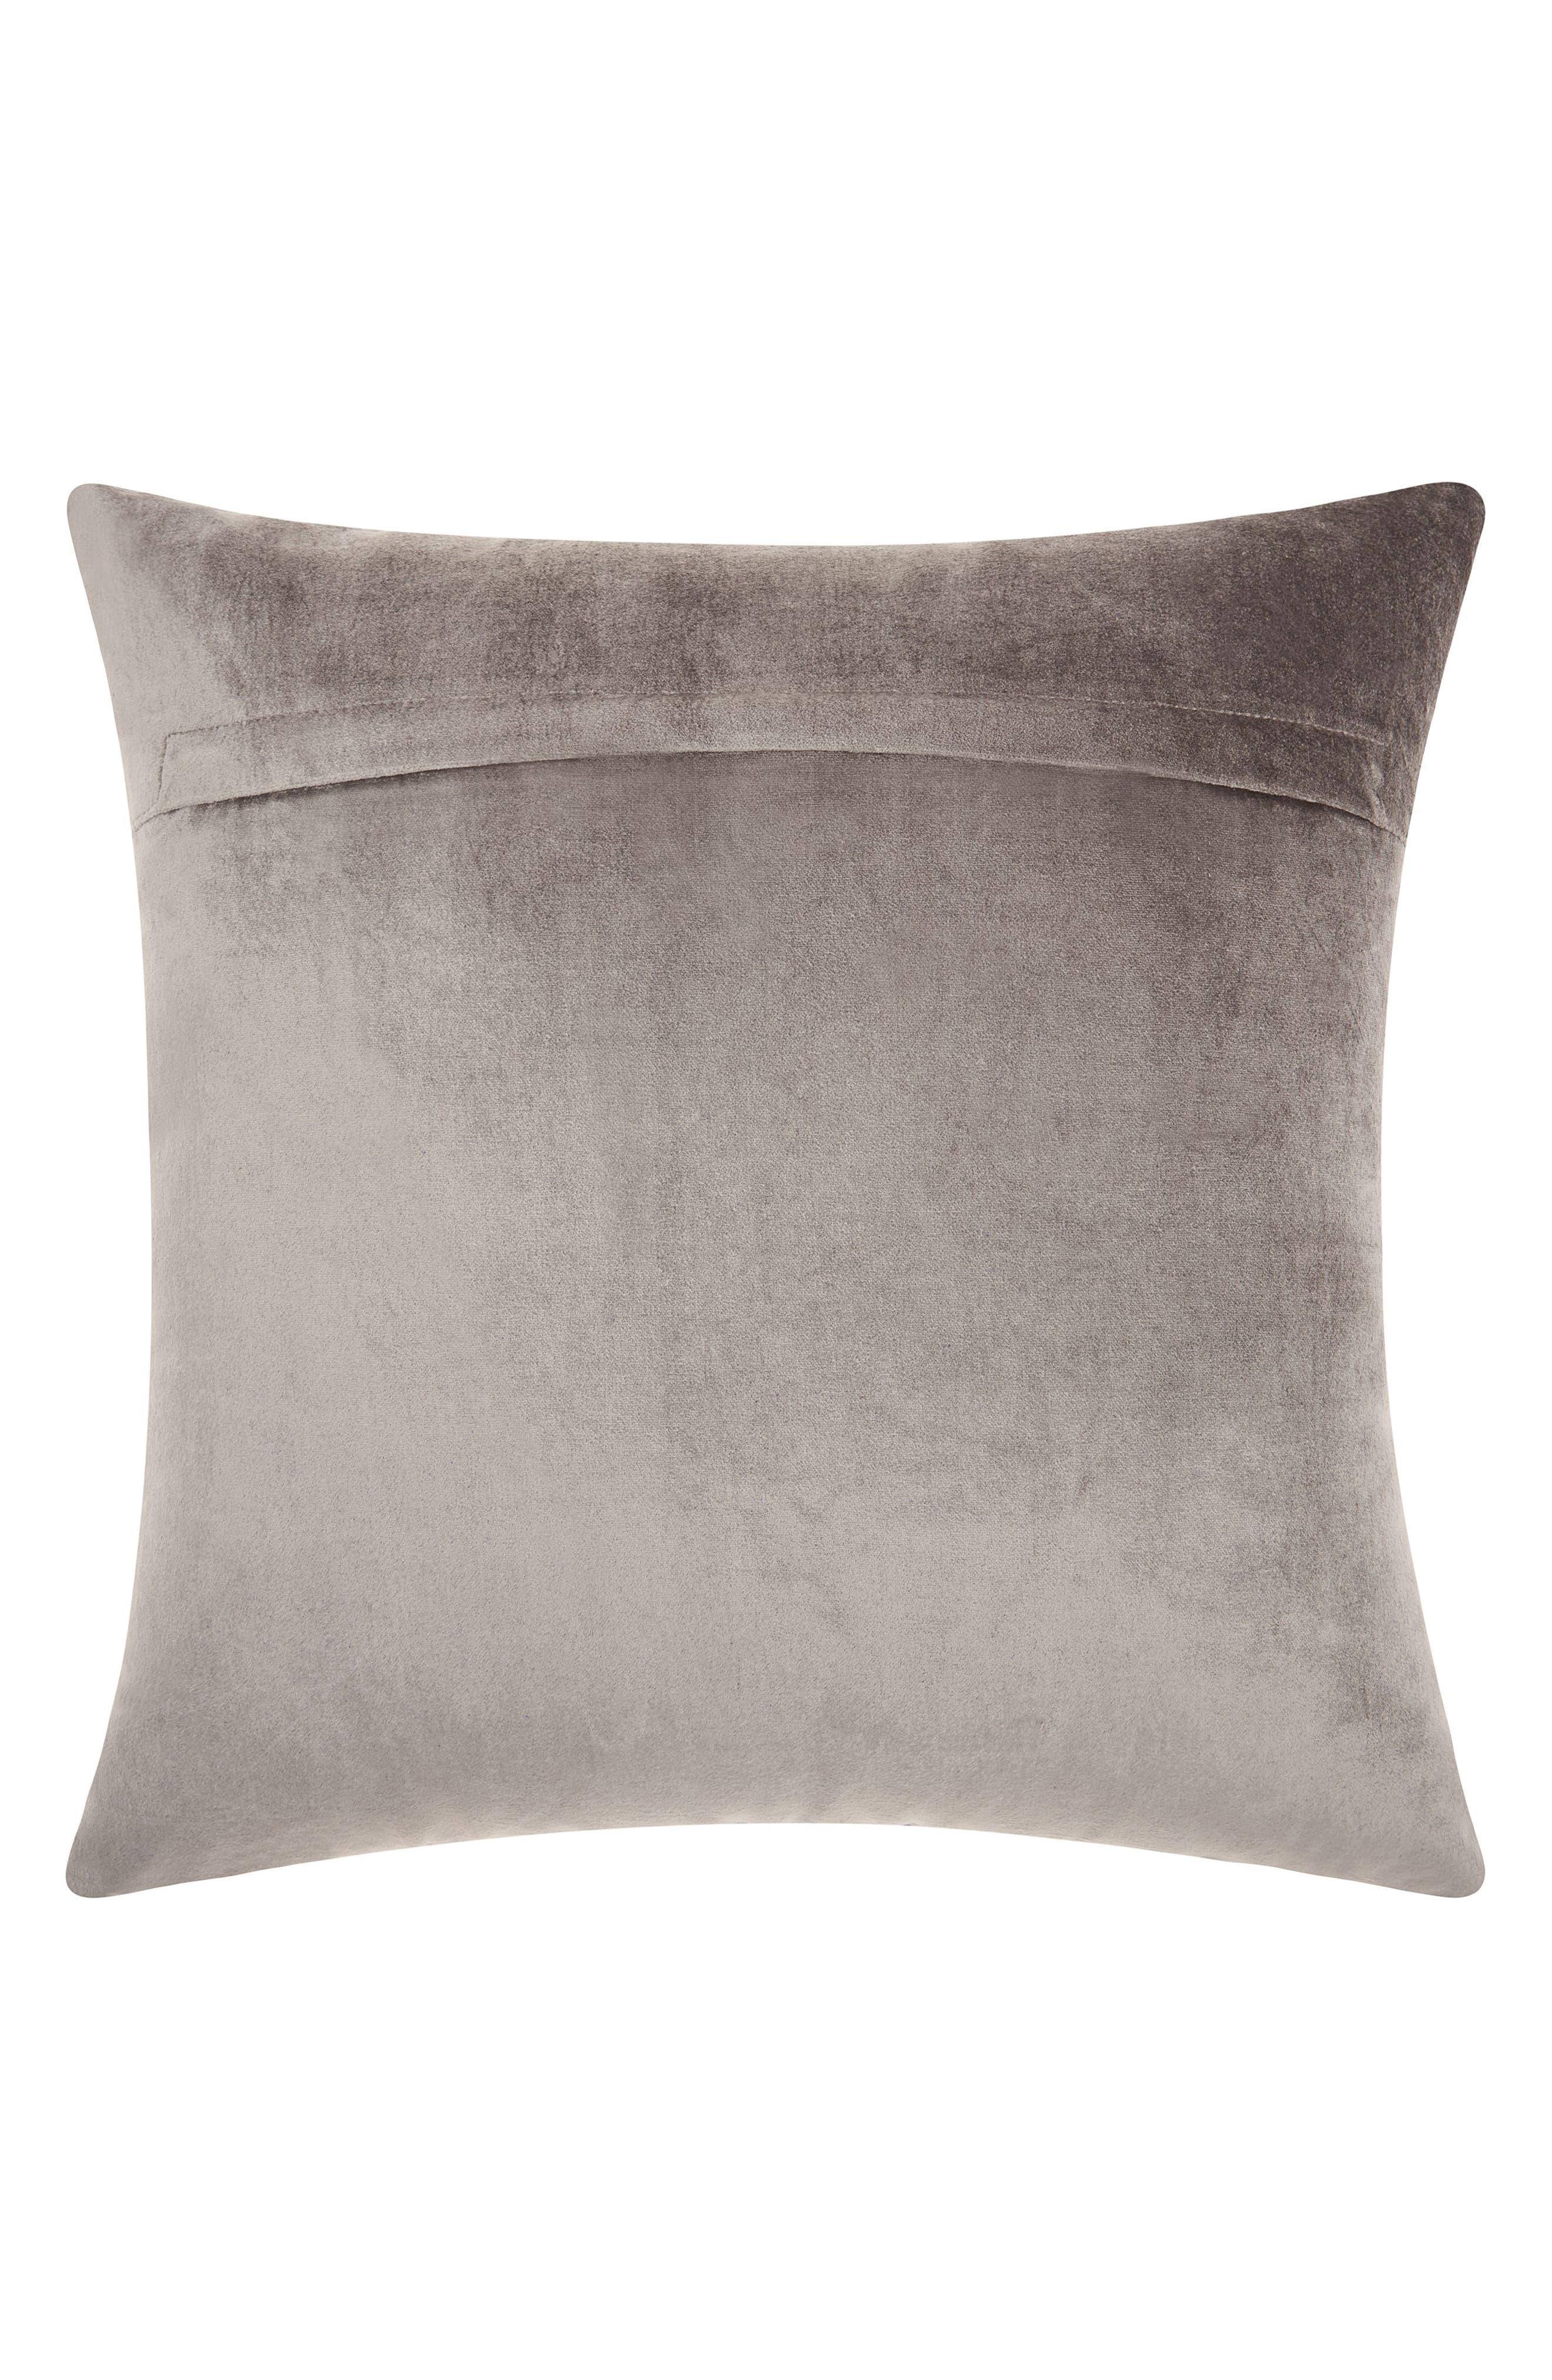 Distressed Velvet Accent Pillow,                             Alternate thumbnail 2, color,                             030